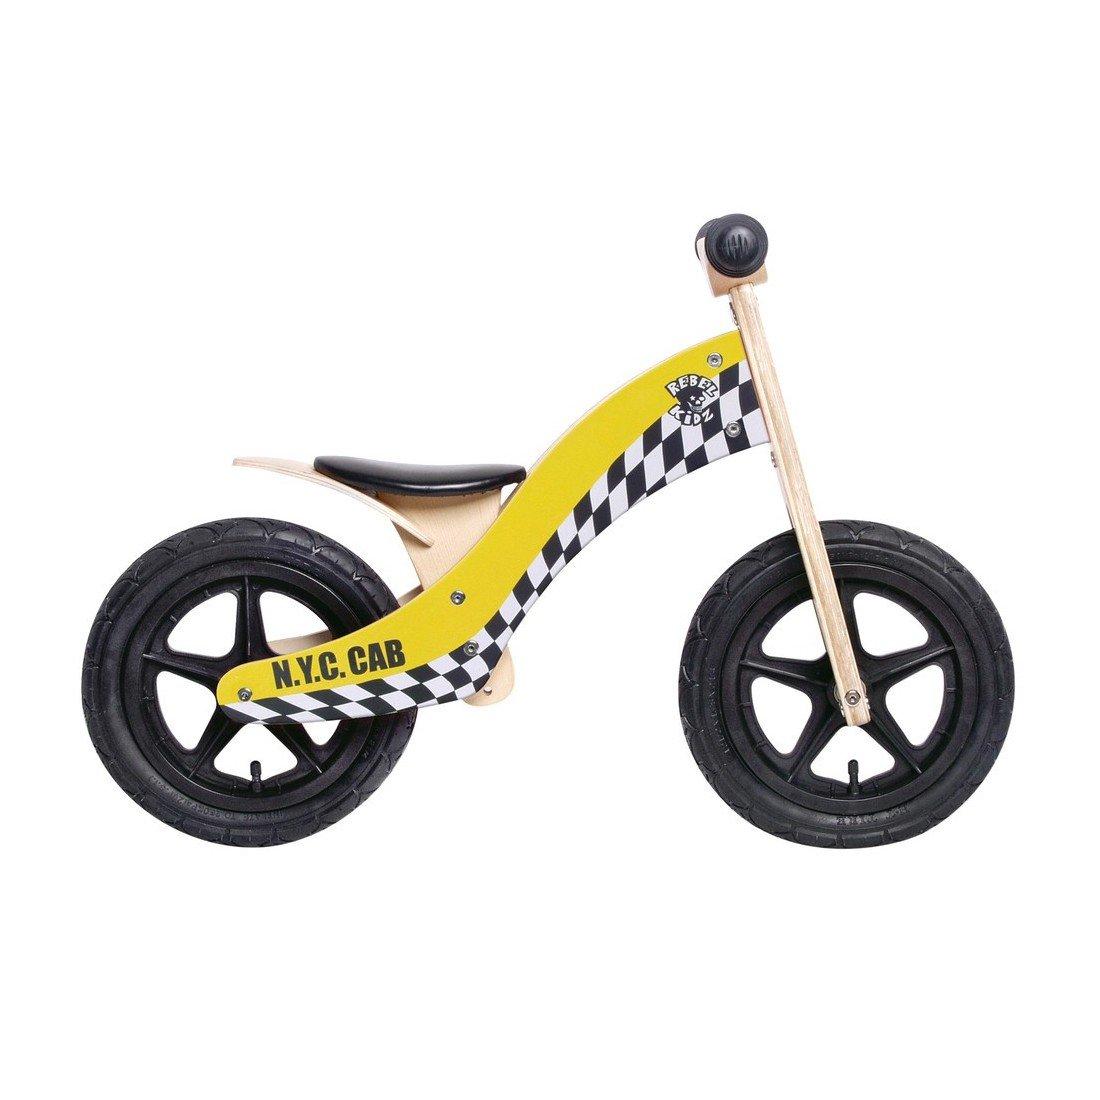 Bici aprendizaje Rebel Kidz Wood Air madera 12 Taxi amarillo